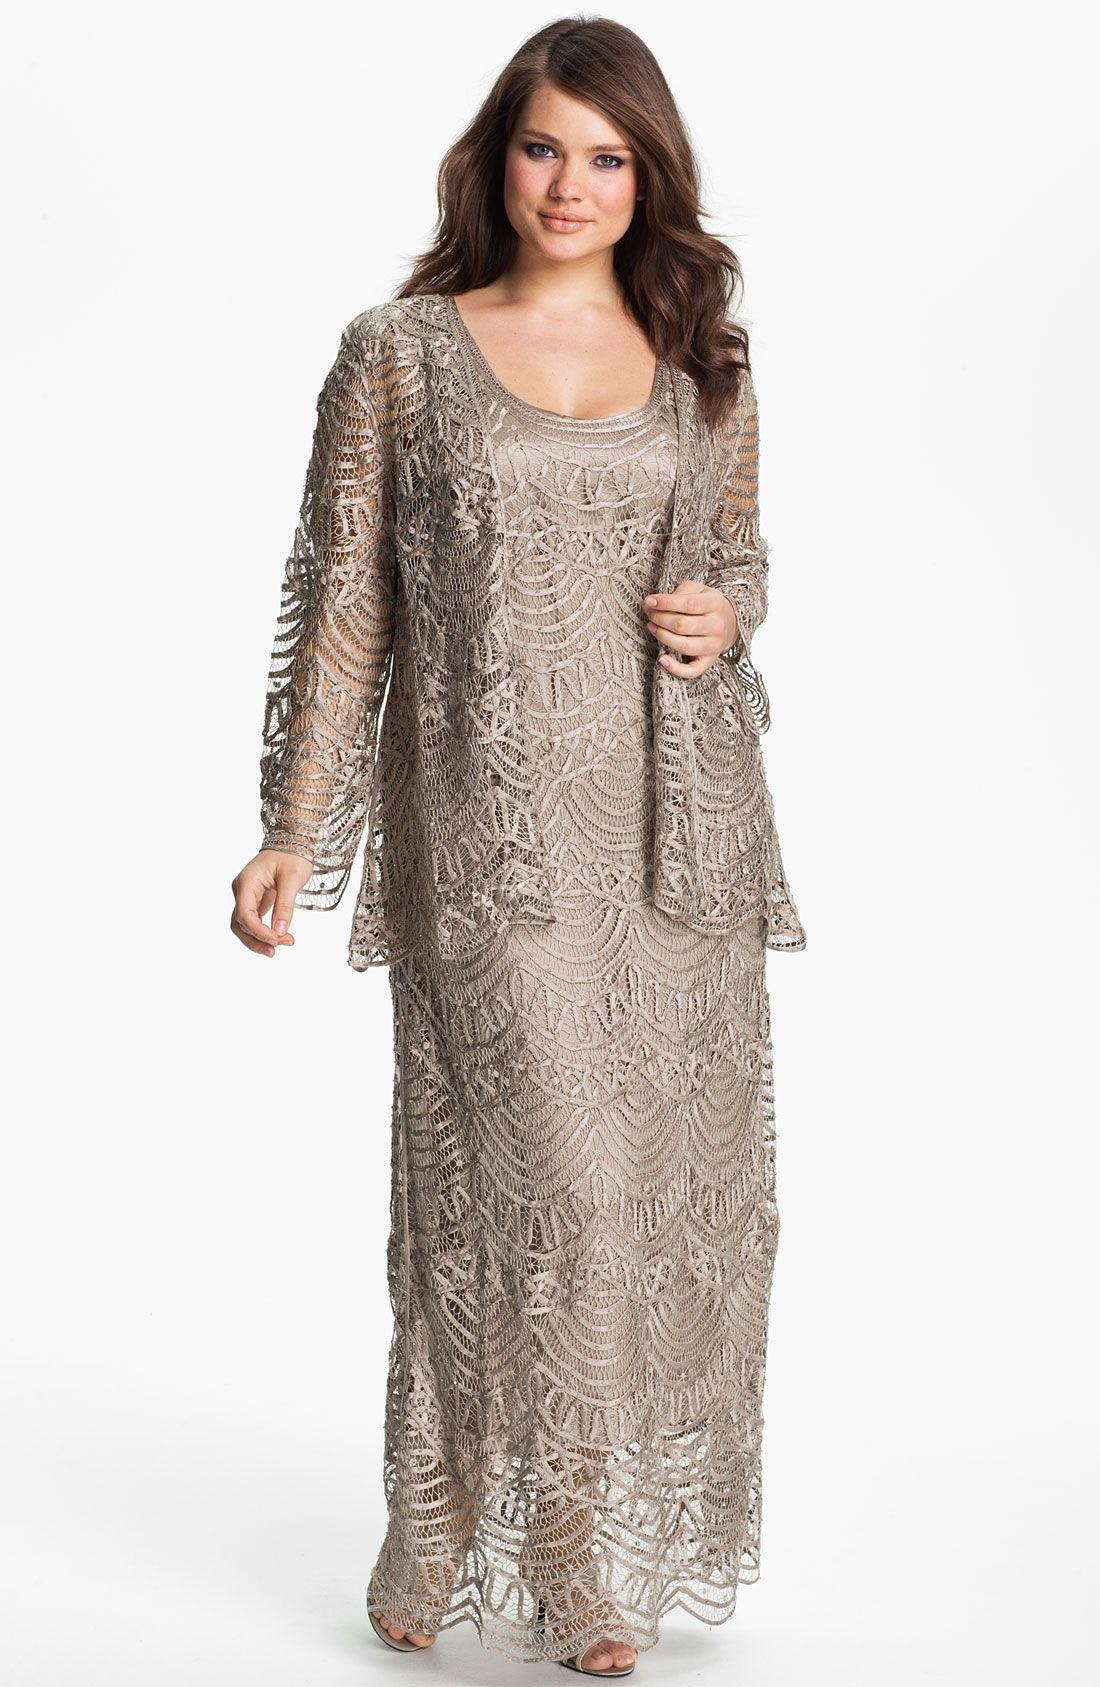 Nordstrom evening dresses plus size - Seovegasnow.com